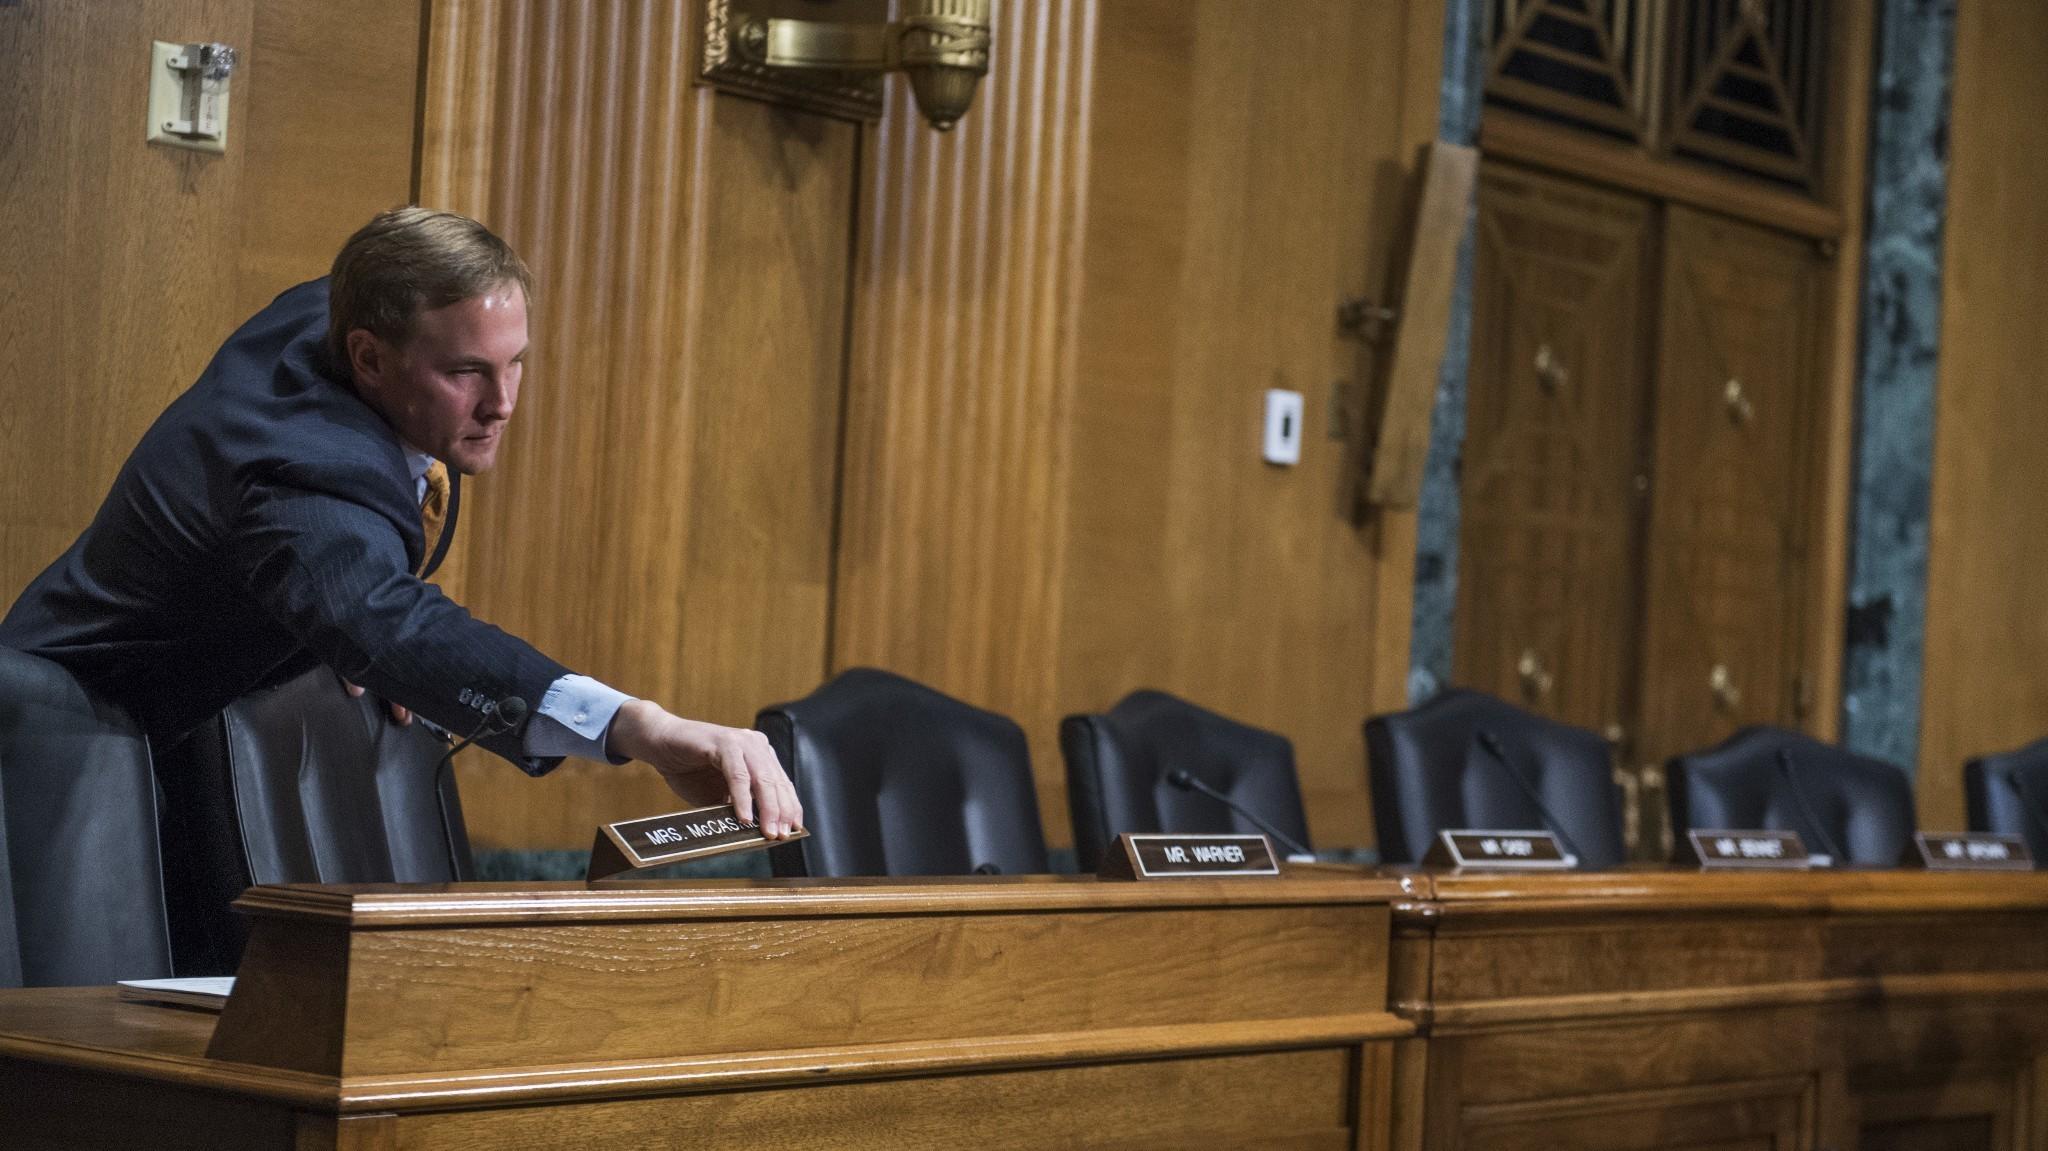 Senate Democrats Block Committee Votes On Two Trump Nominees